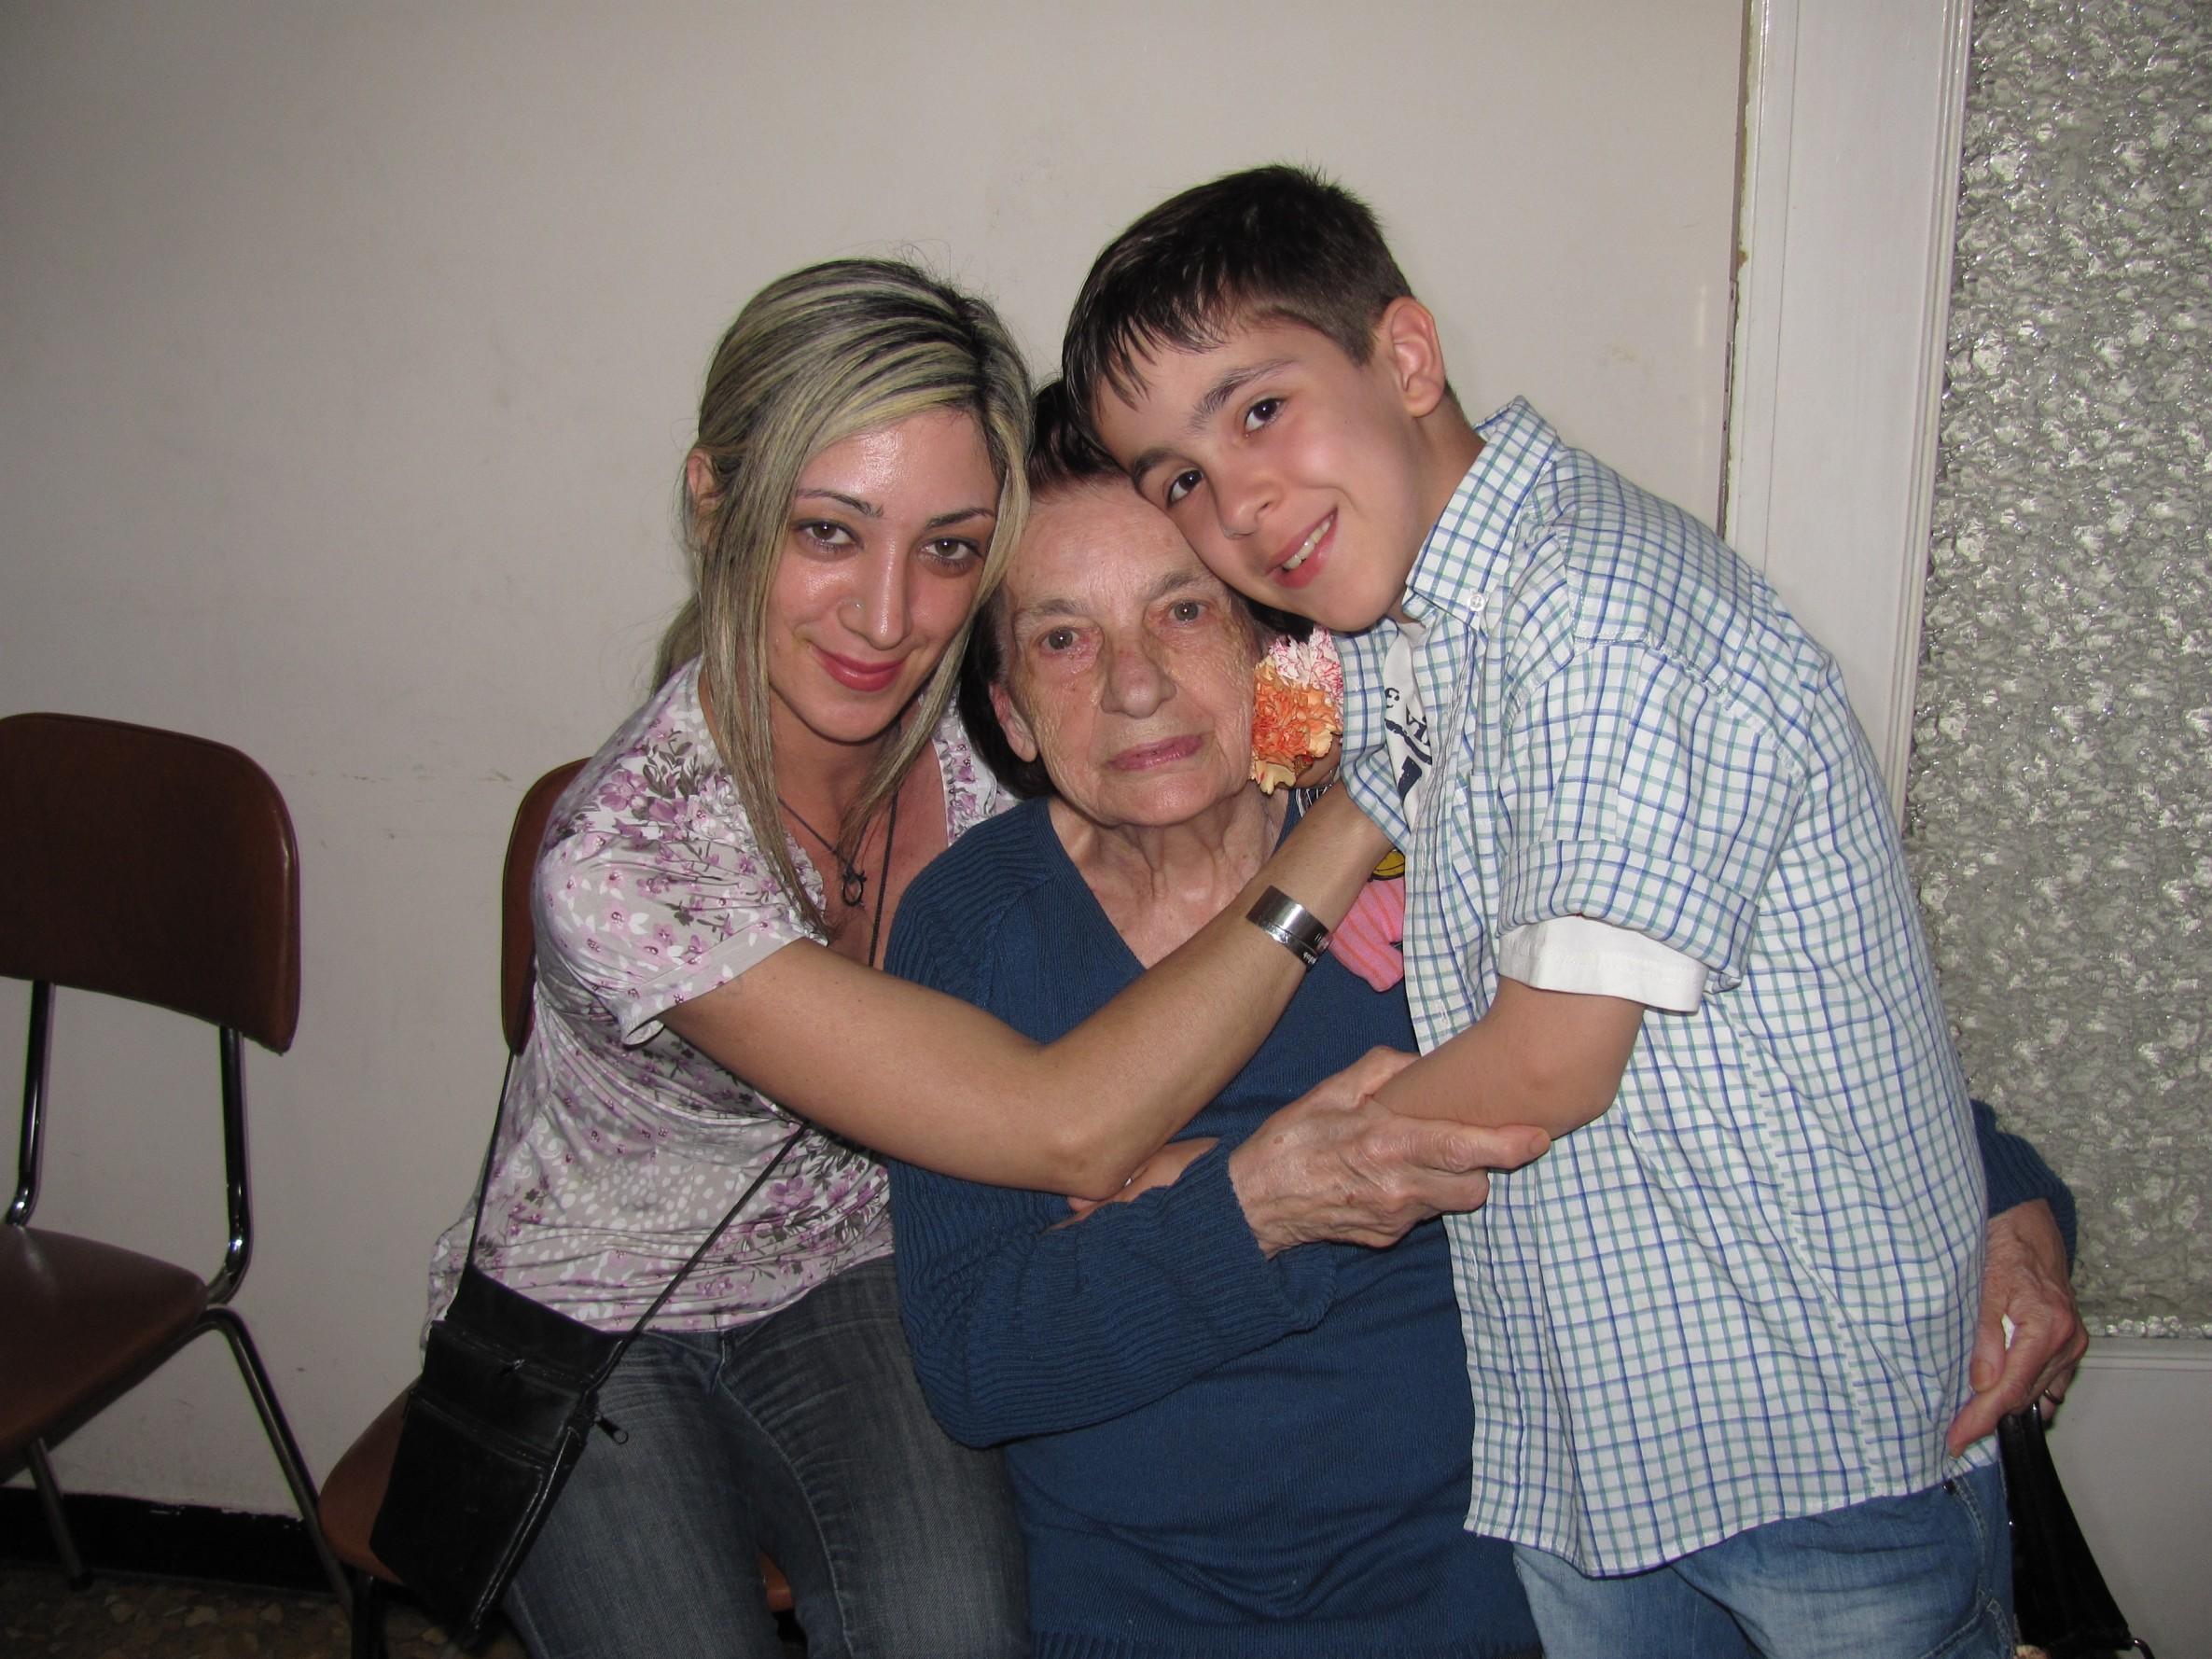 festa_madonna-2011-05-30-00-00-34